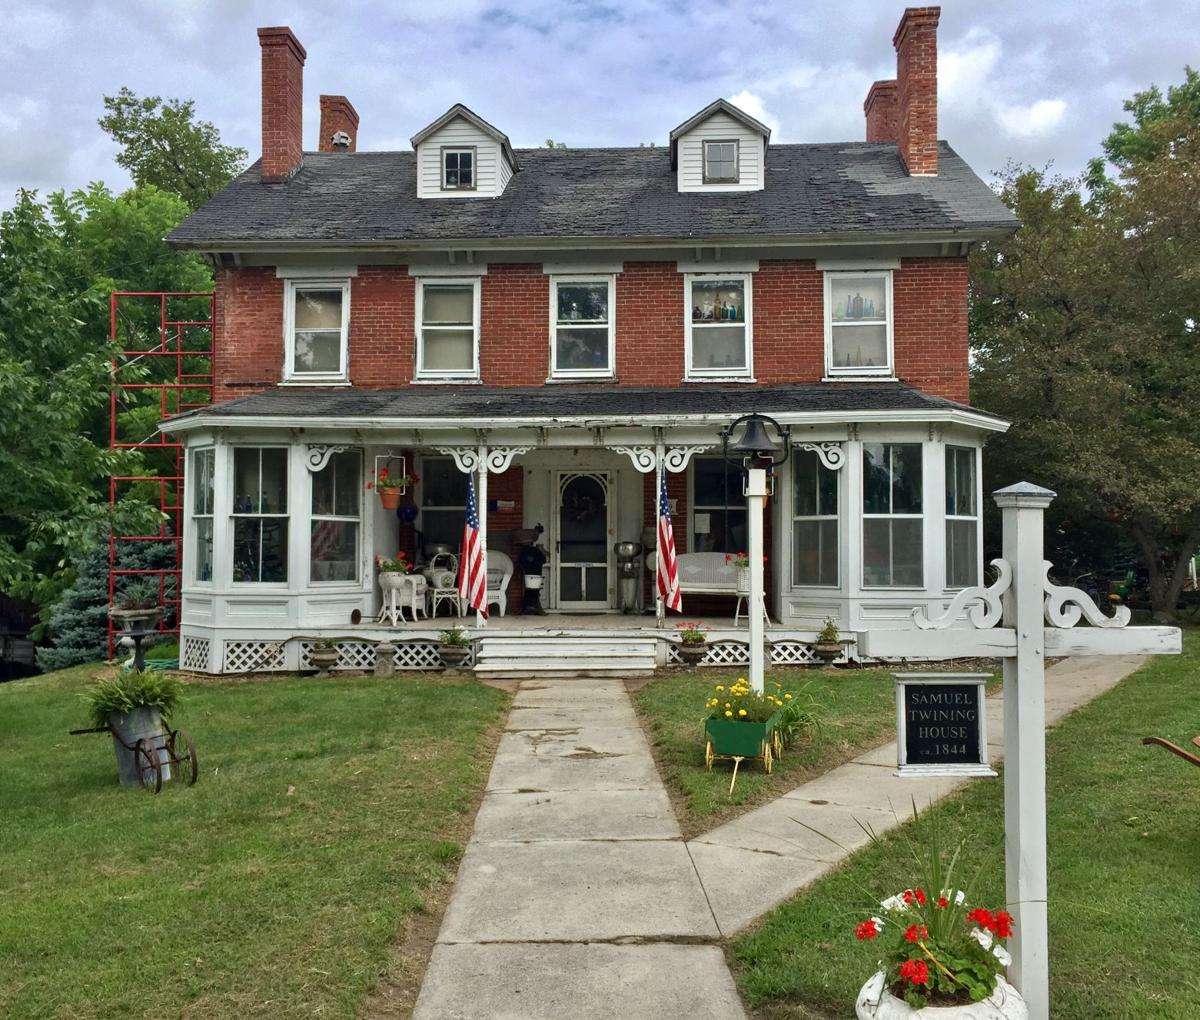 Samuel Twining House